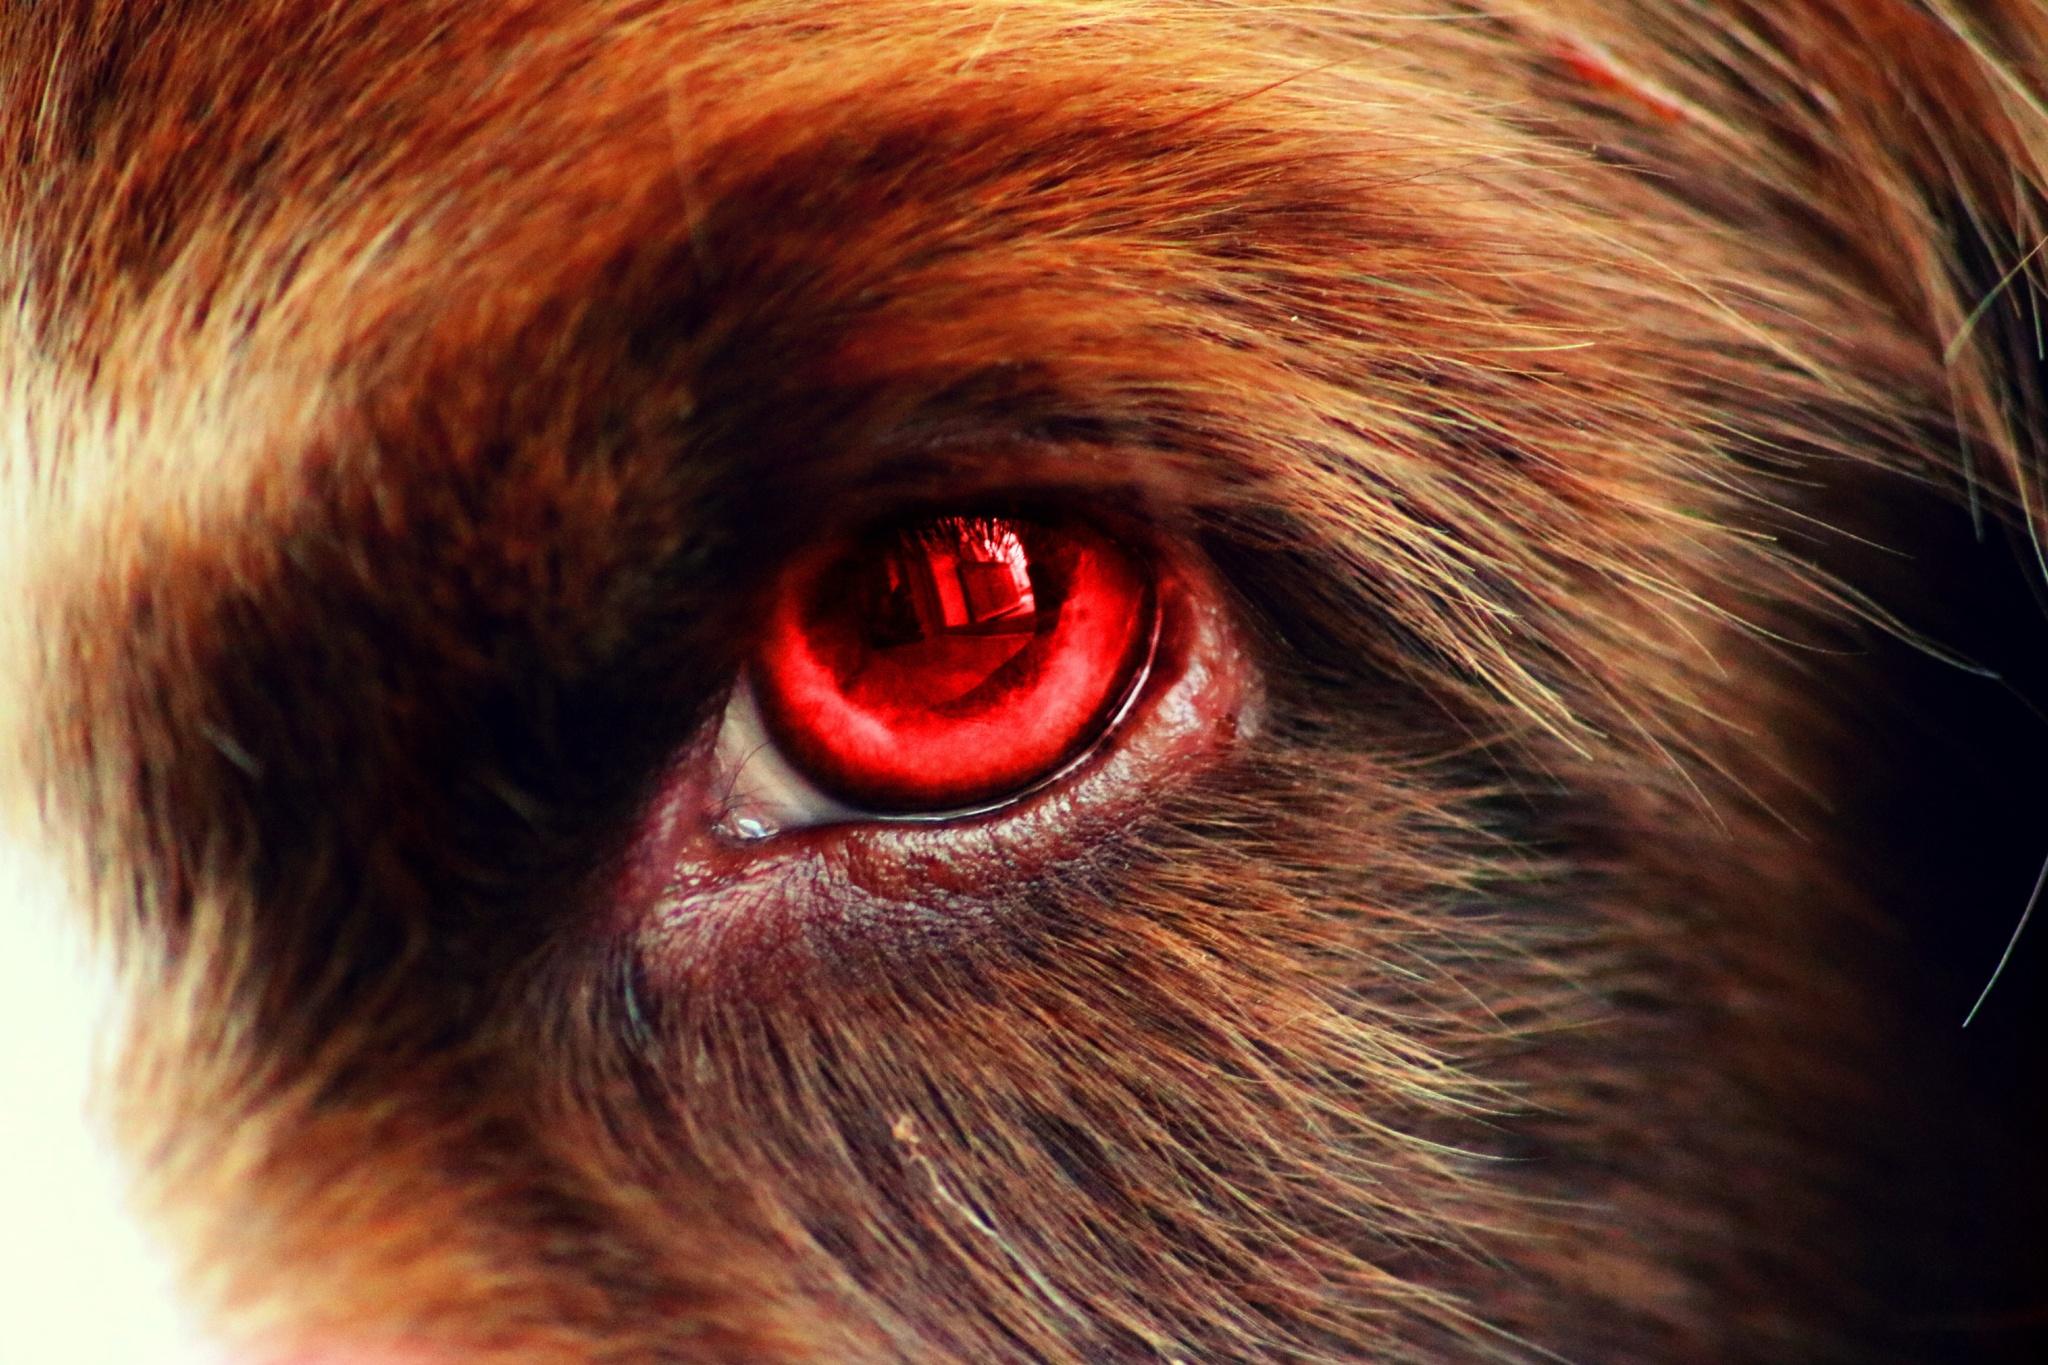 eye of a werewolf by Josephine